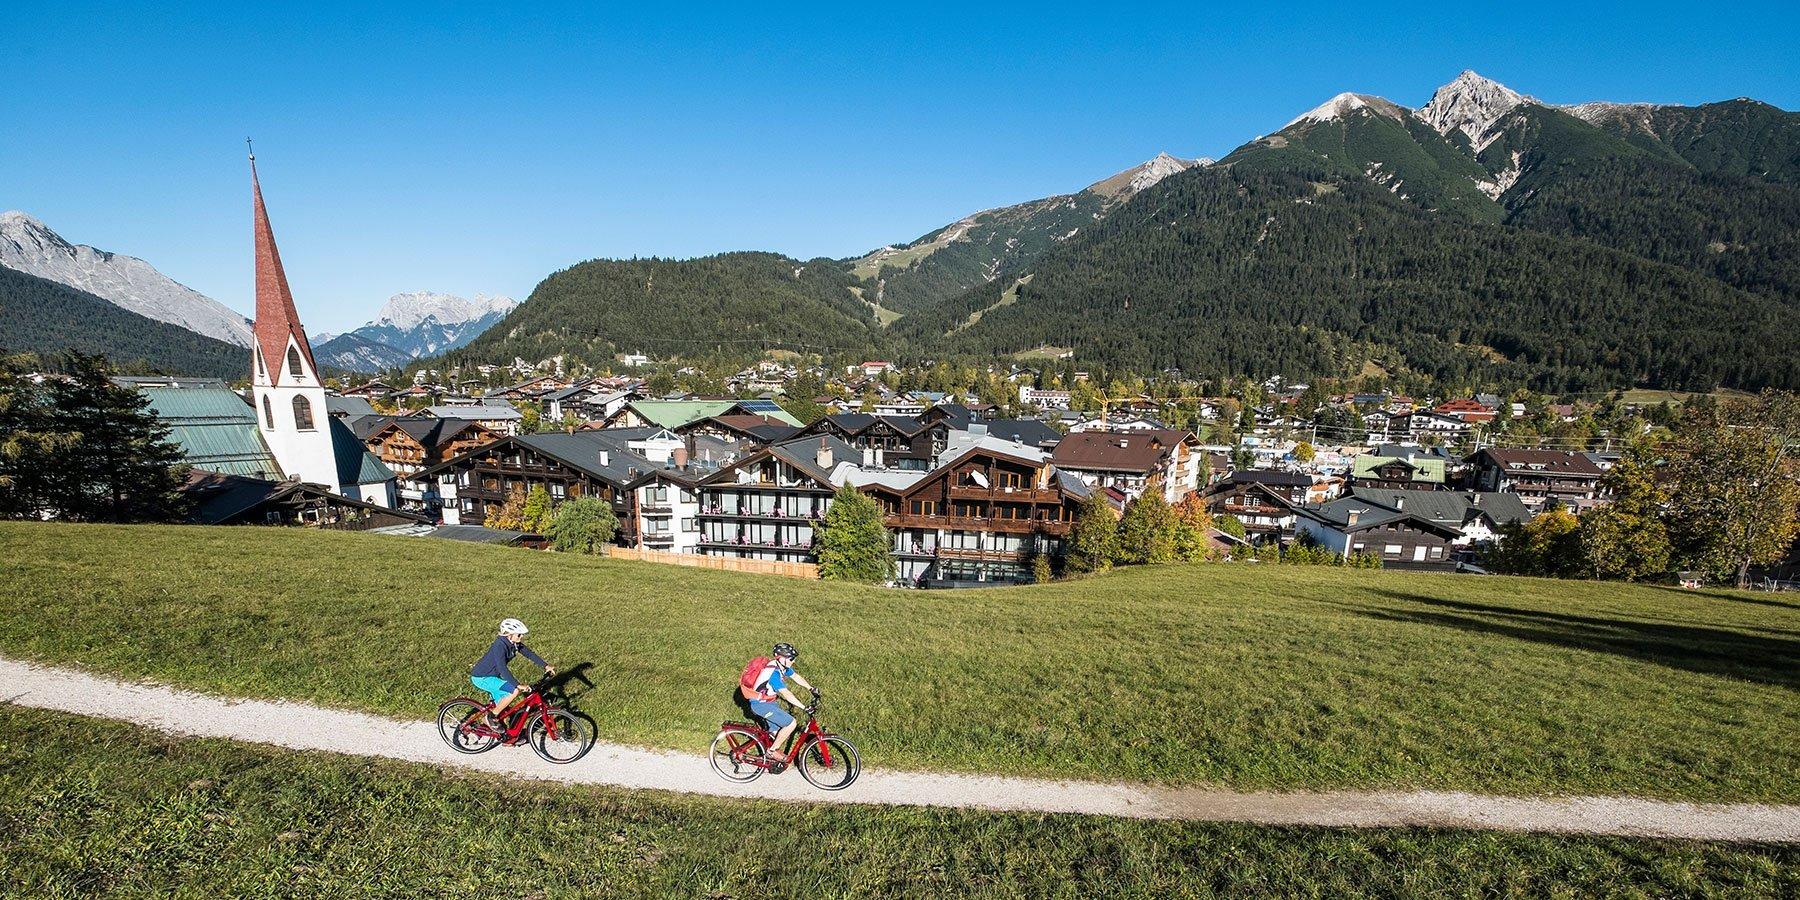 frau sucht mann in Seefeld in Tirol - Erotik & Sex